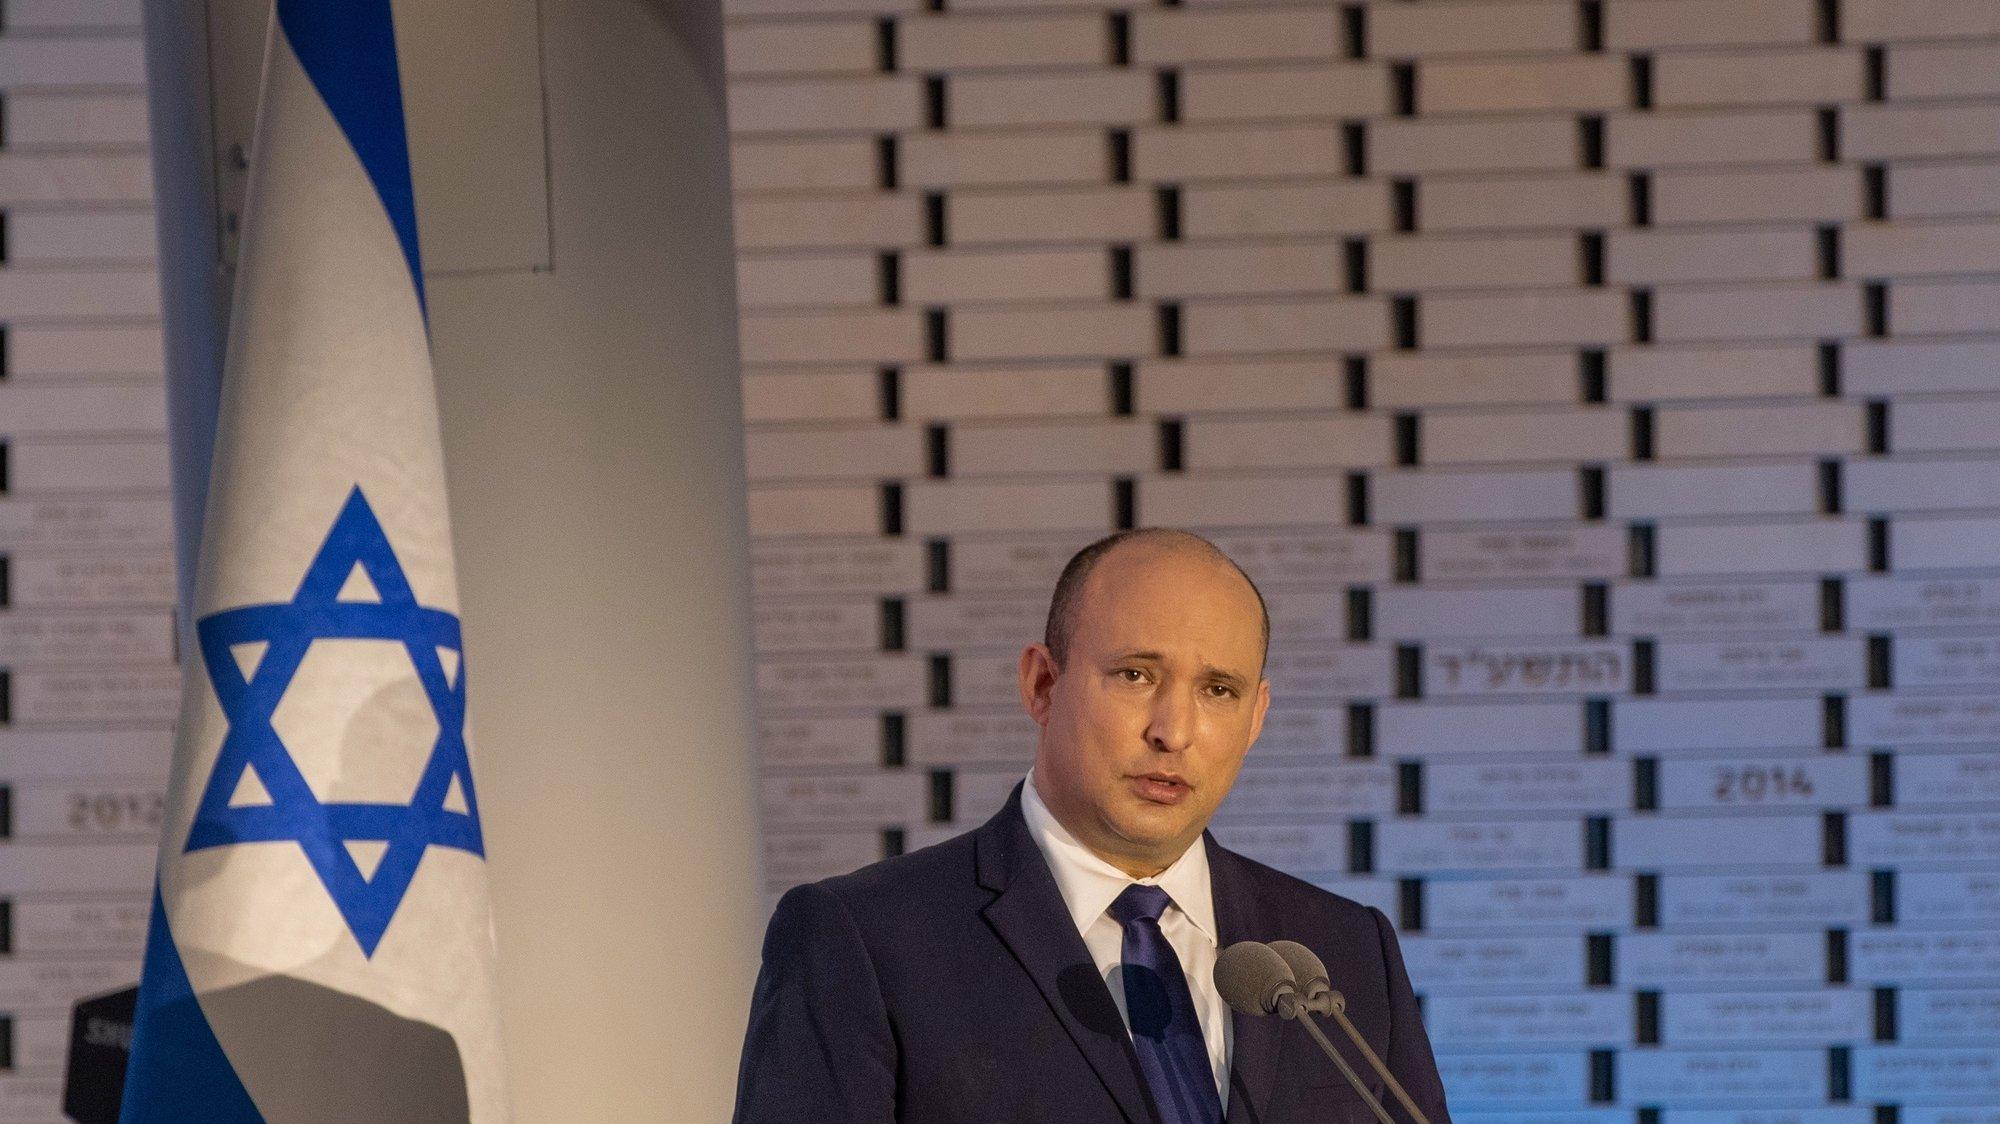 epa09476104 Israeli Prime Minister Naftali Bennett attends the 48th memorial ceremony for the fallen of the Yom Kippur War, also known as the Ramadan War or October War, at Mt. Herzl in Jerusalem, 19 September 2021.  EPA/Ohad Zwigenberg / POOL